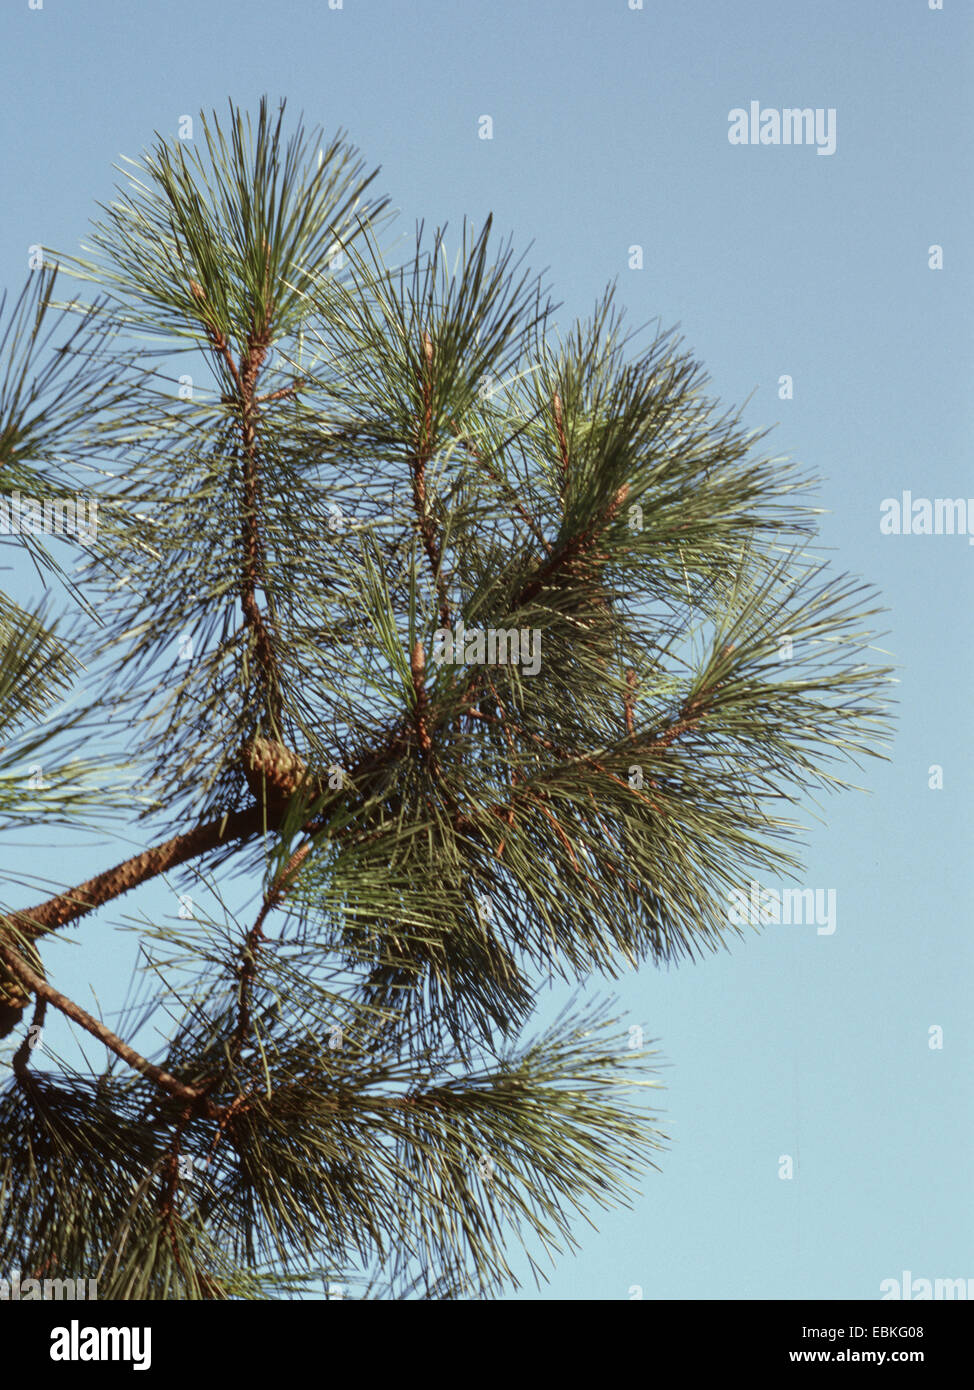 maritime pine (Pinus pinaster), branches - Stock Image